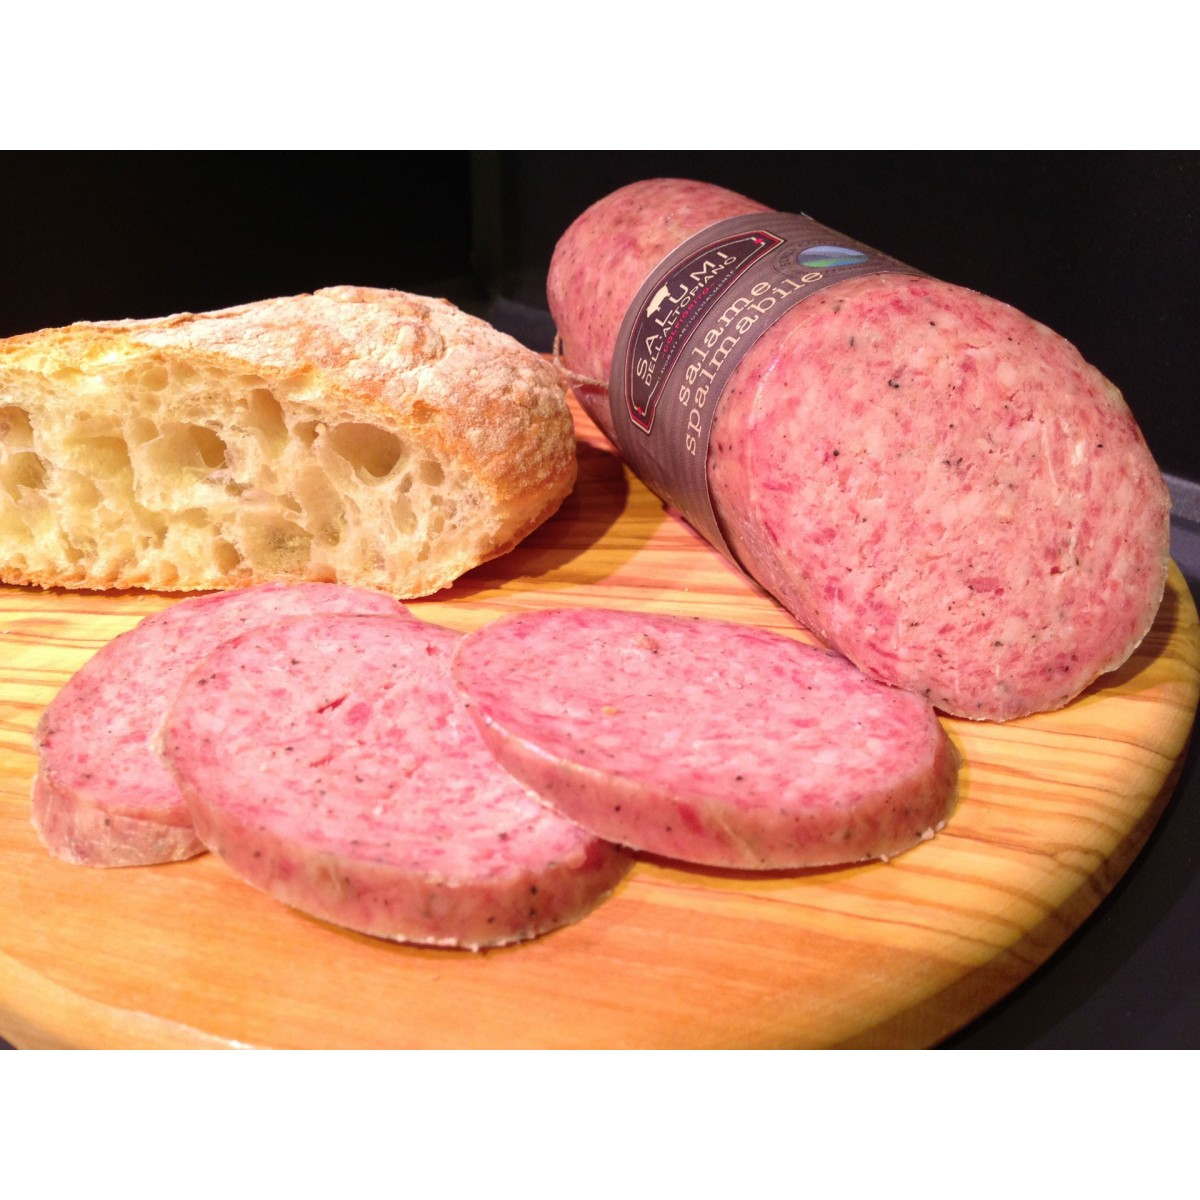 Spreadable salami Italian Colfiorito Plateau 750g / 800g